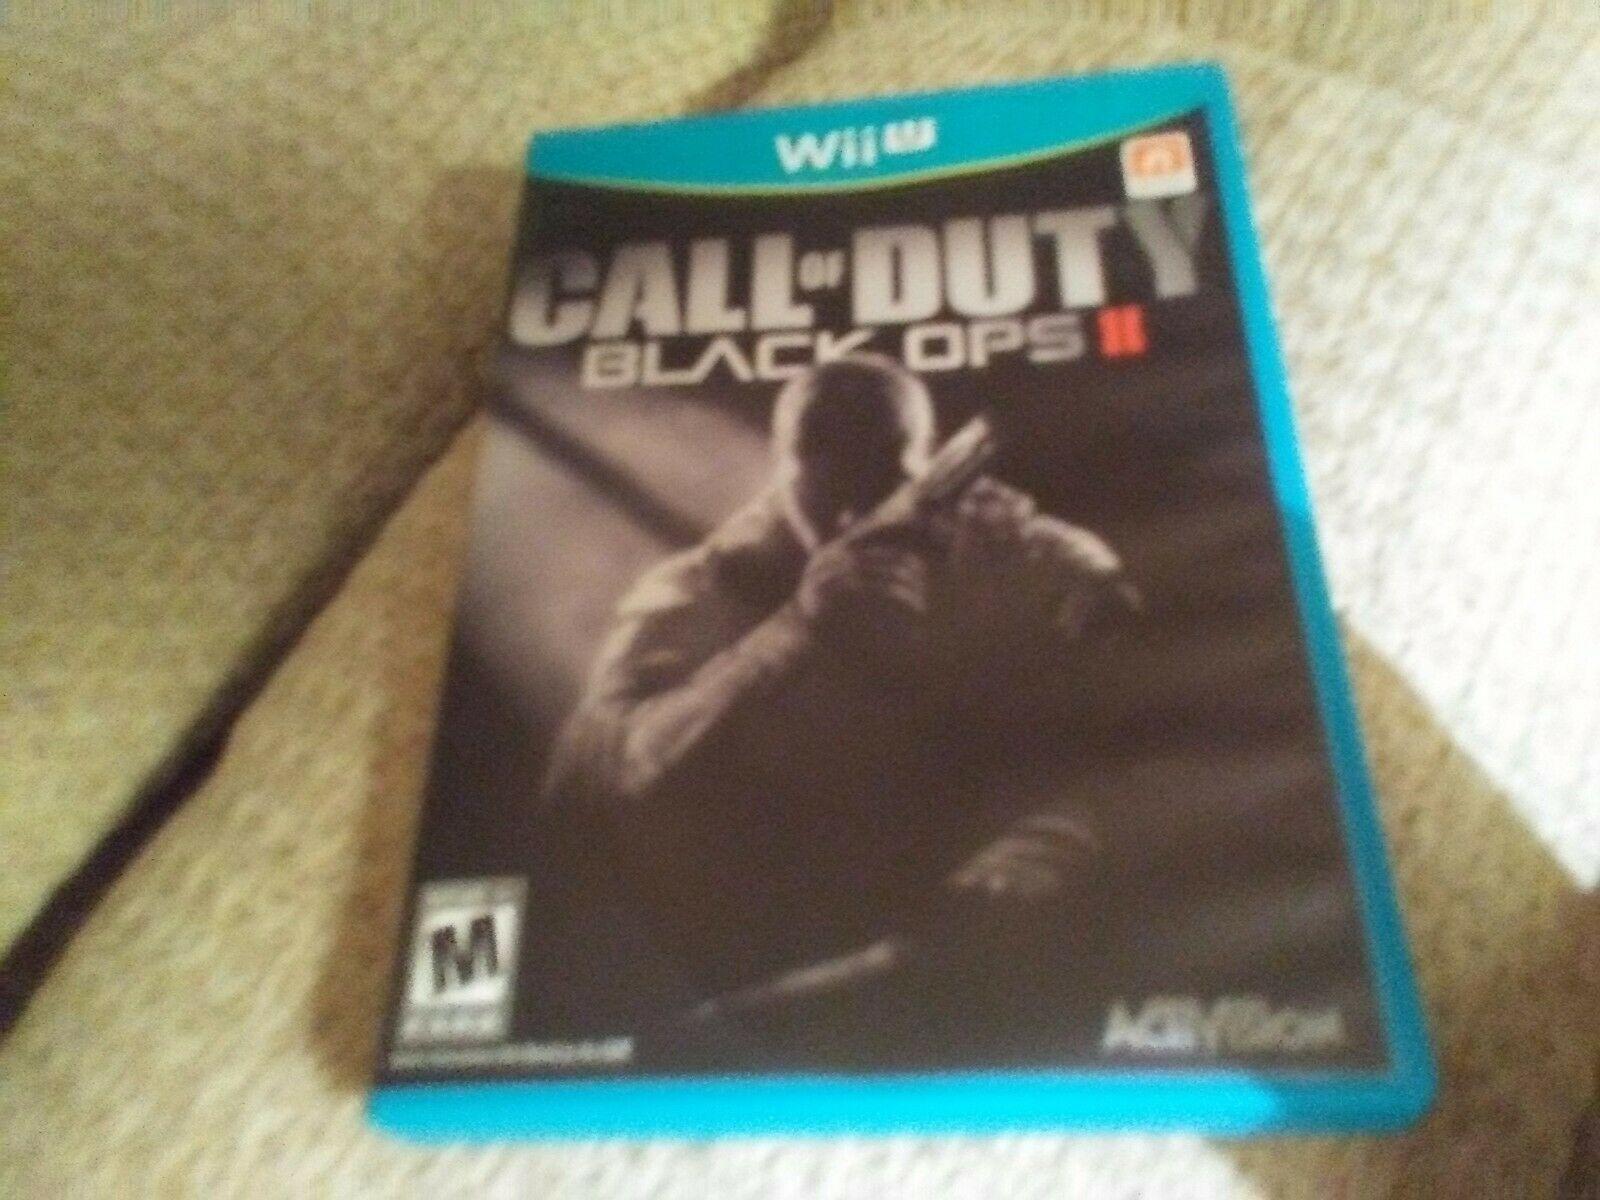 Call of Duty: Black Ops II (Nintendo Wii U, 2012) image 3